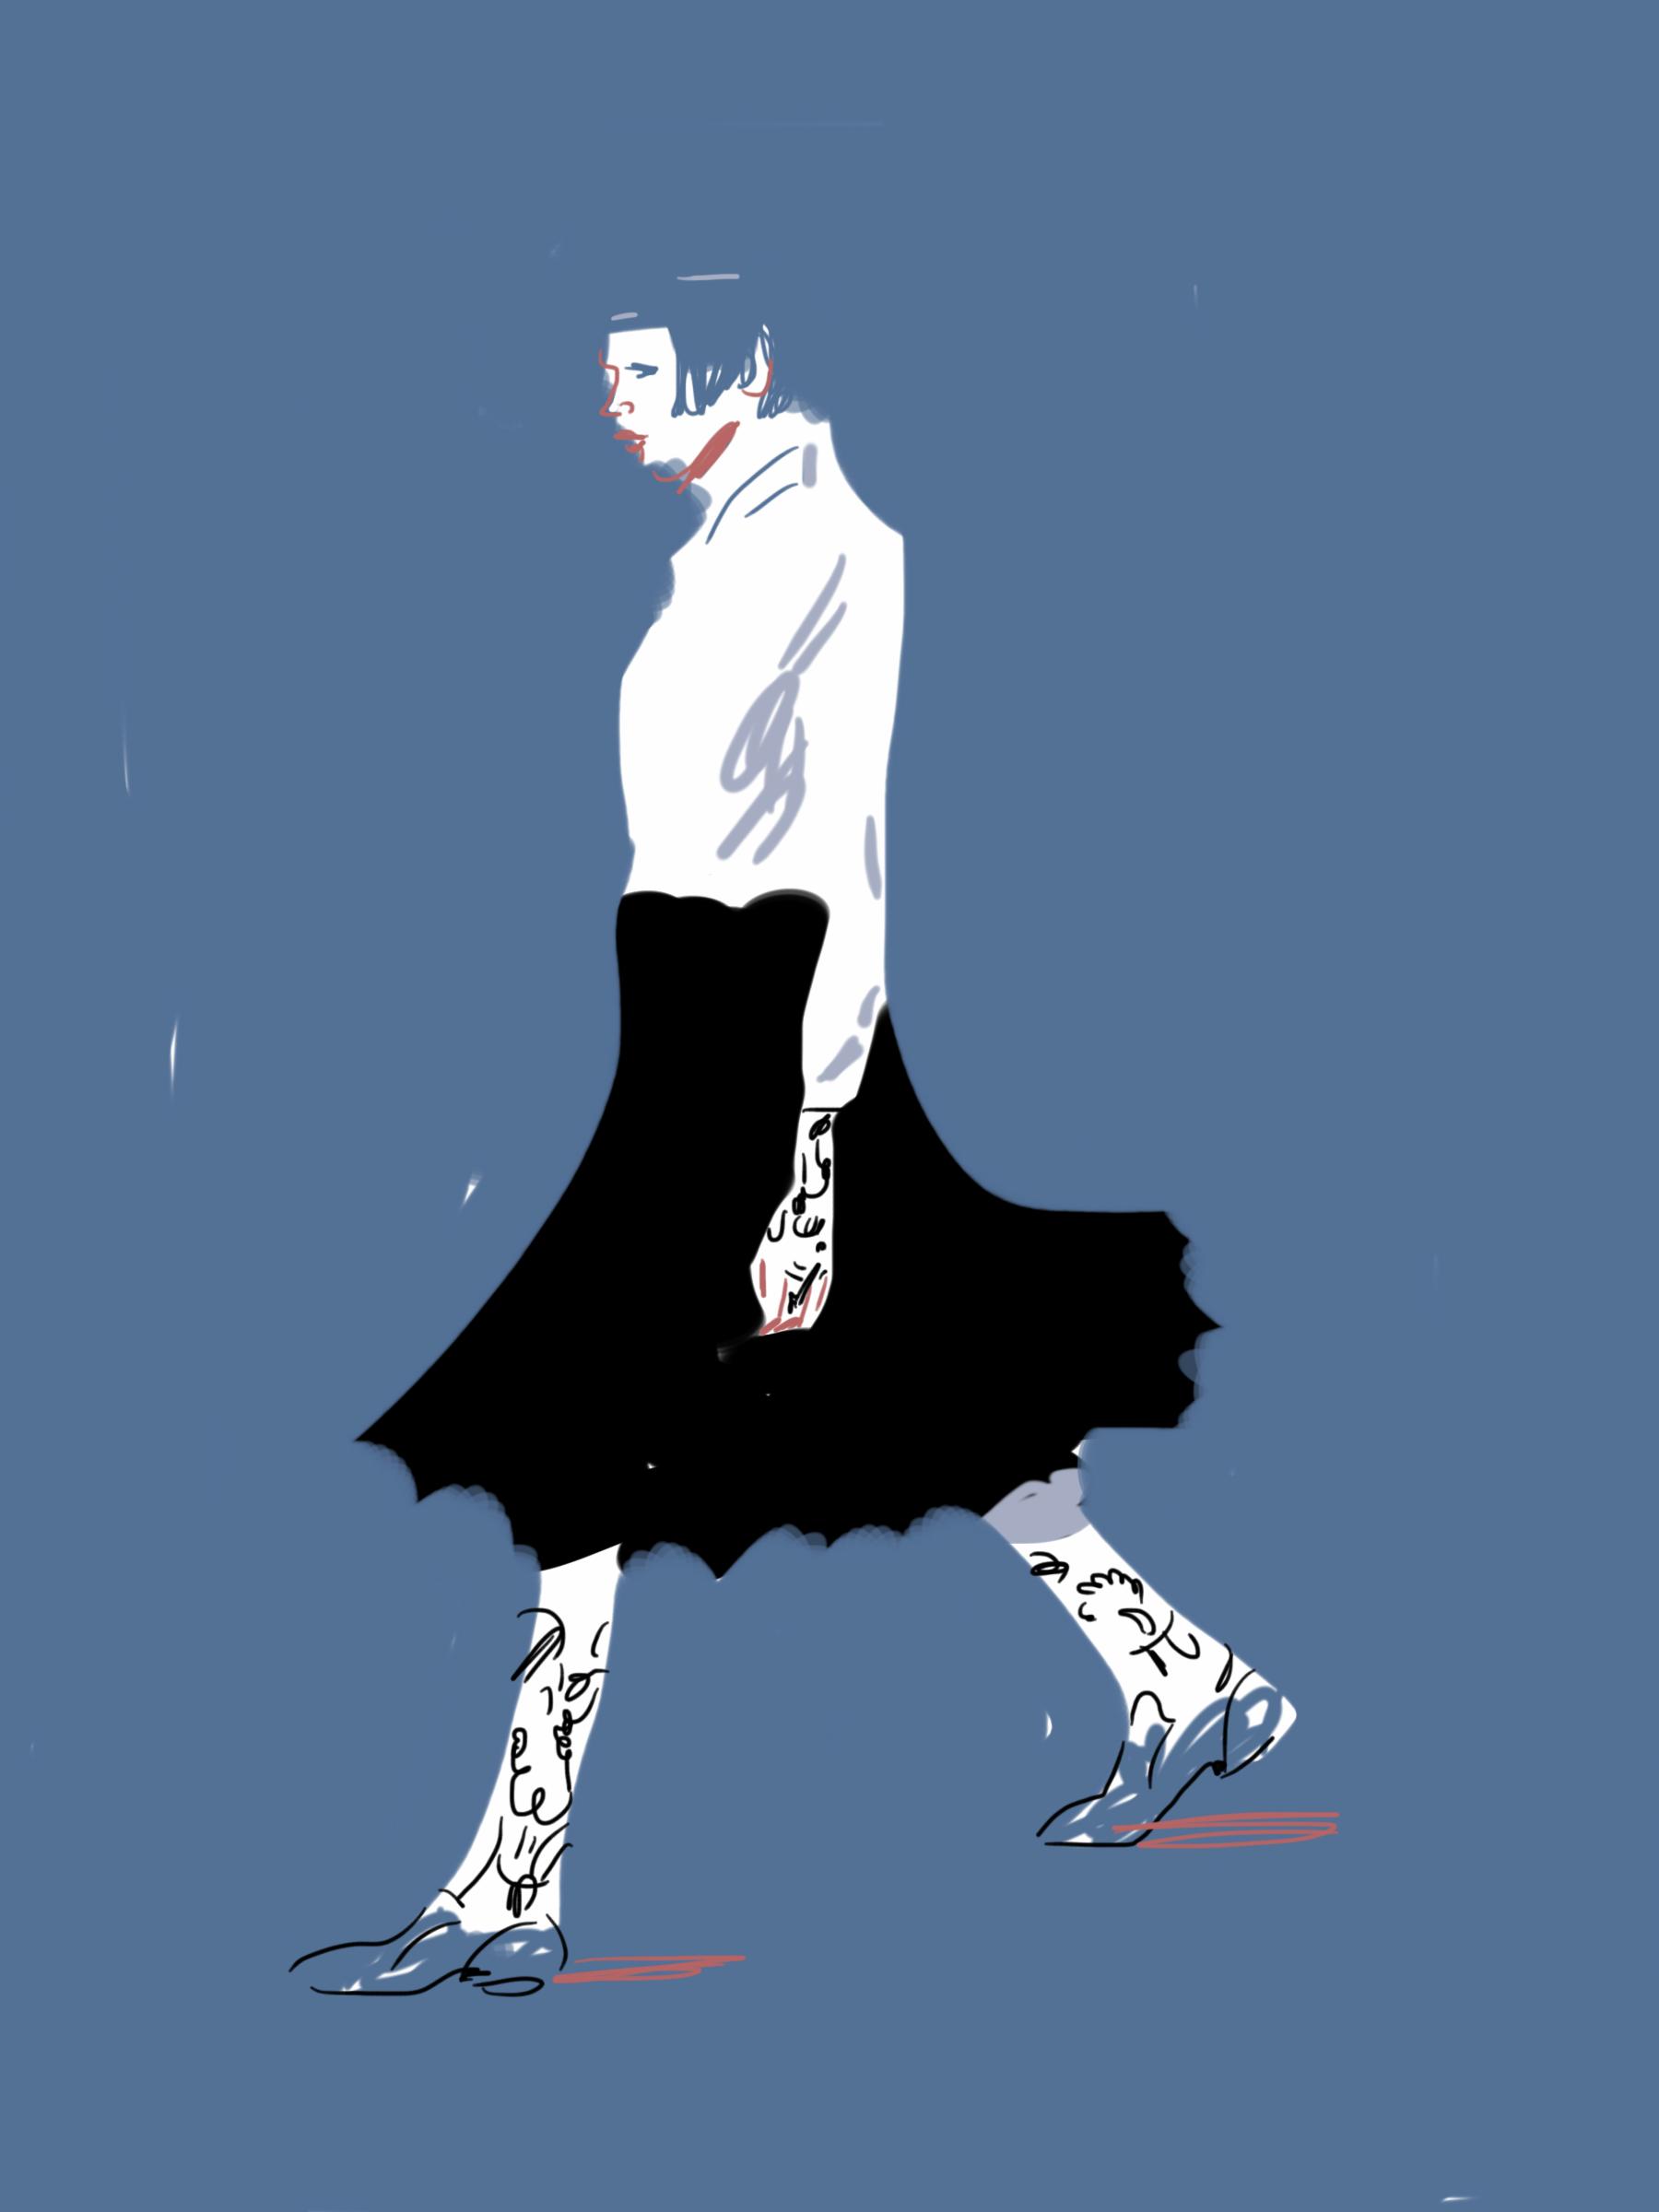 Watanabe - Runway illustration by Silvana Mariani